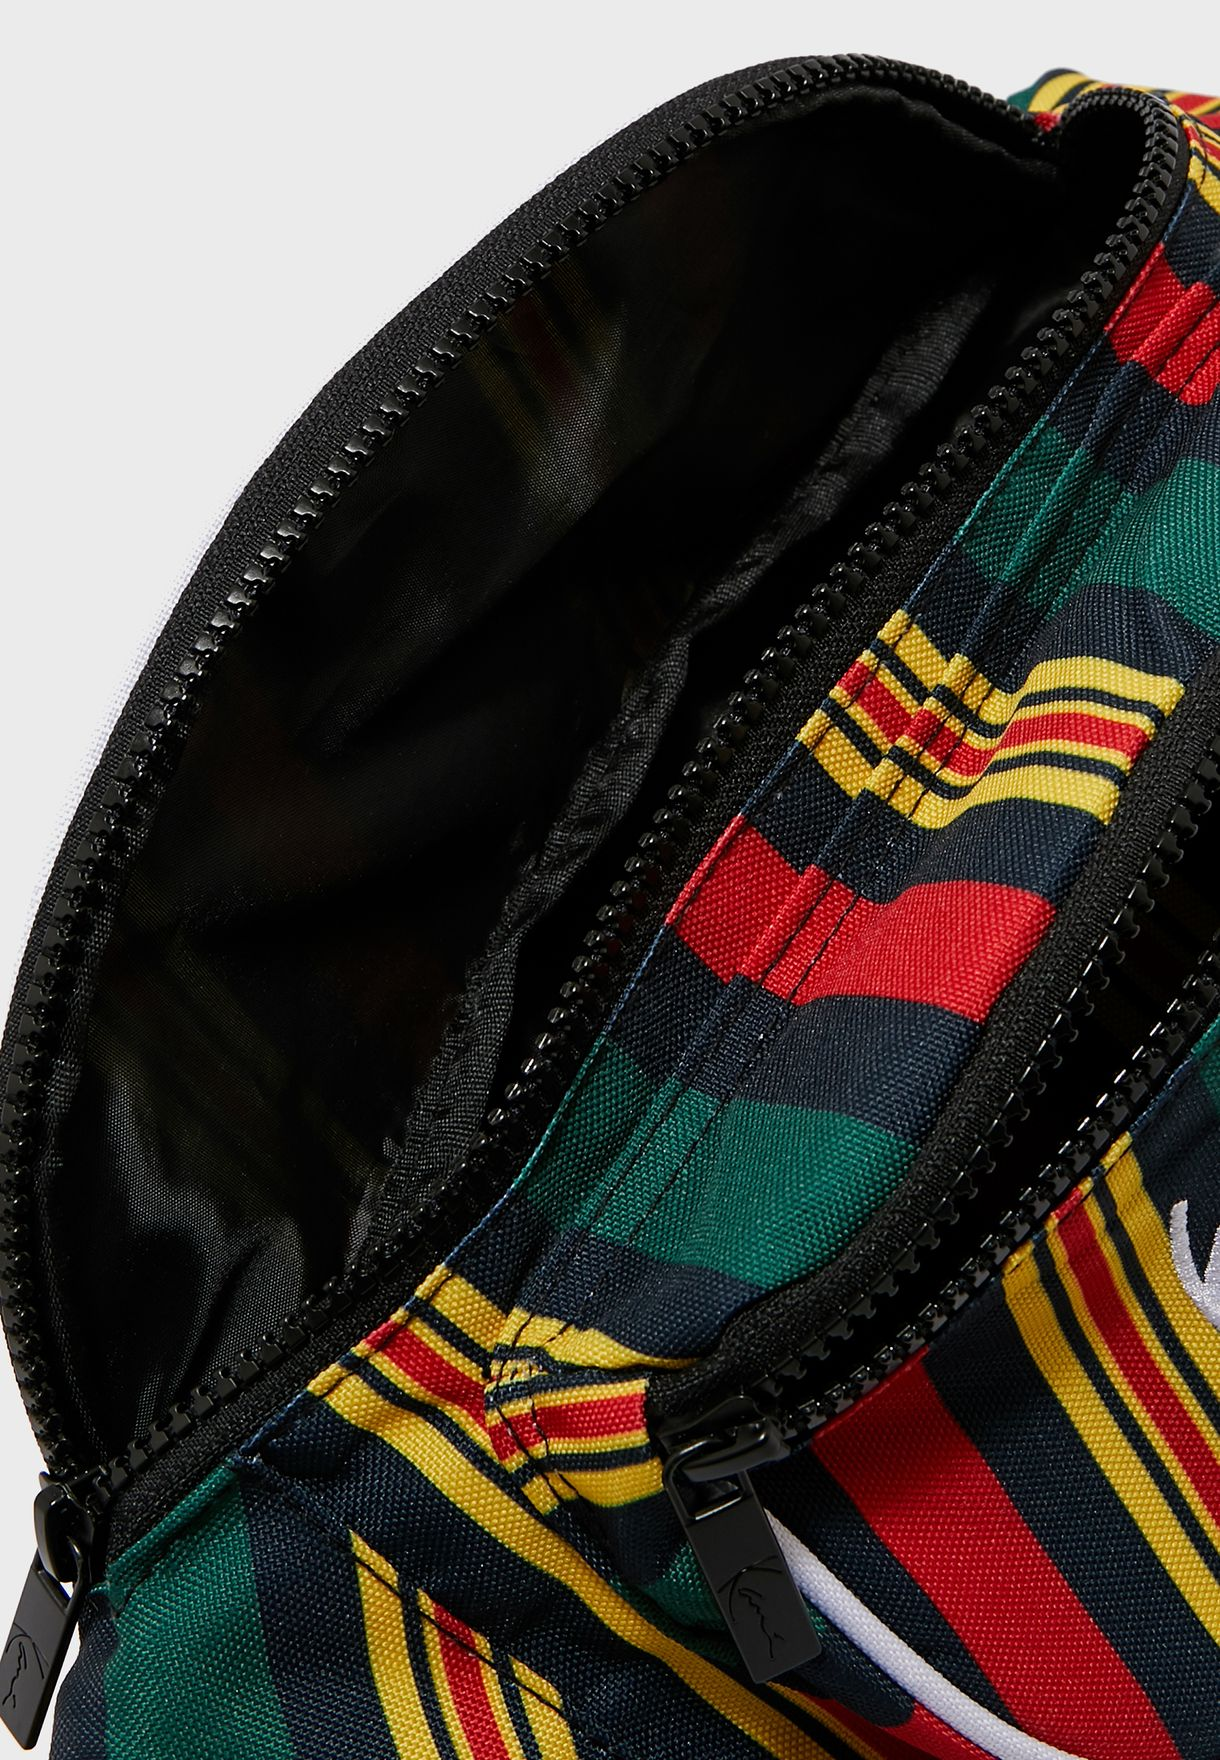 Signature Striped Waist Bag